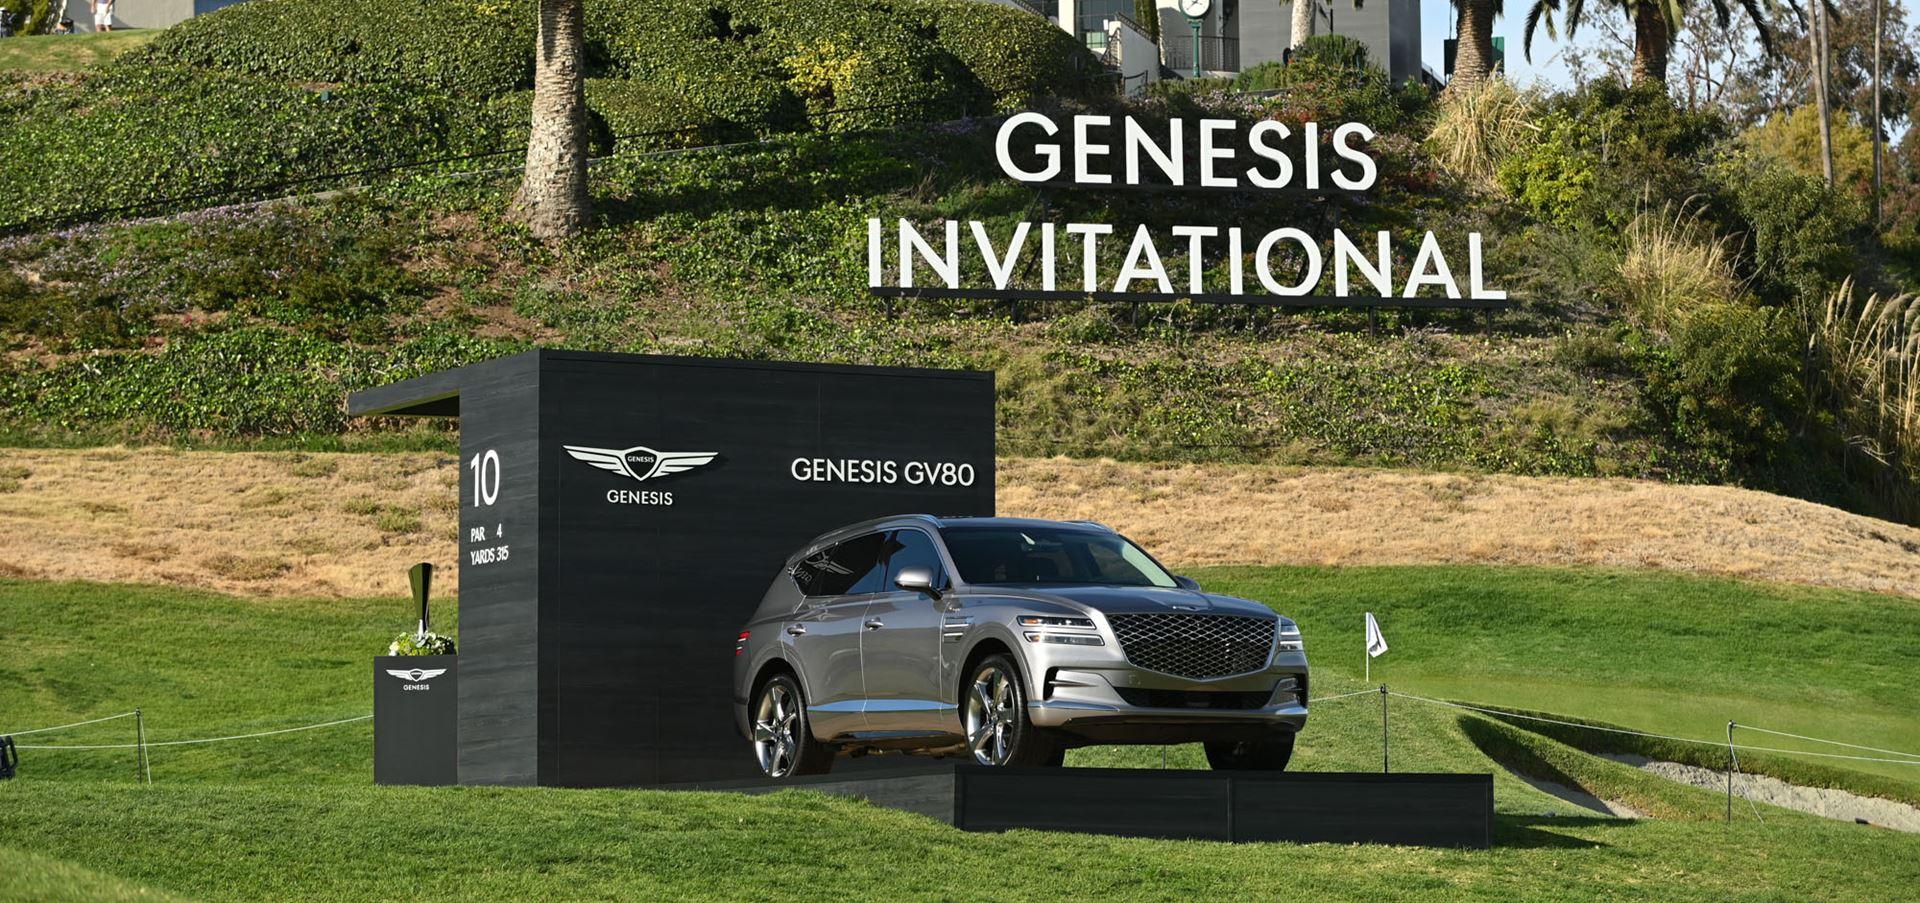 GENESIS RETURNS FOR FIFTH YEAR OF THE GENESIS INVITATIONAL